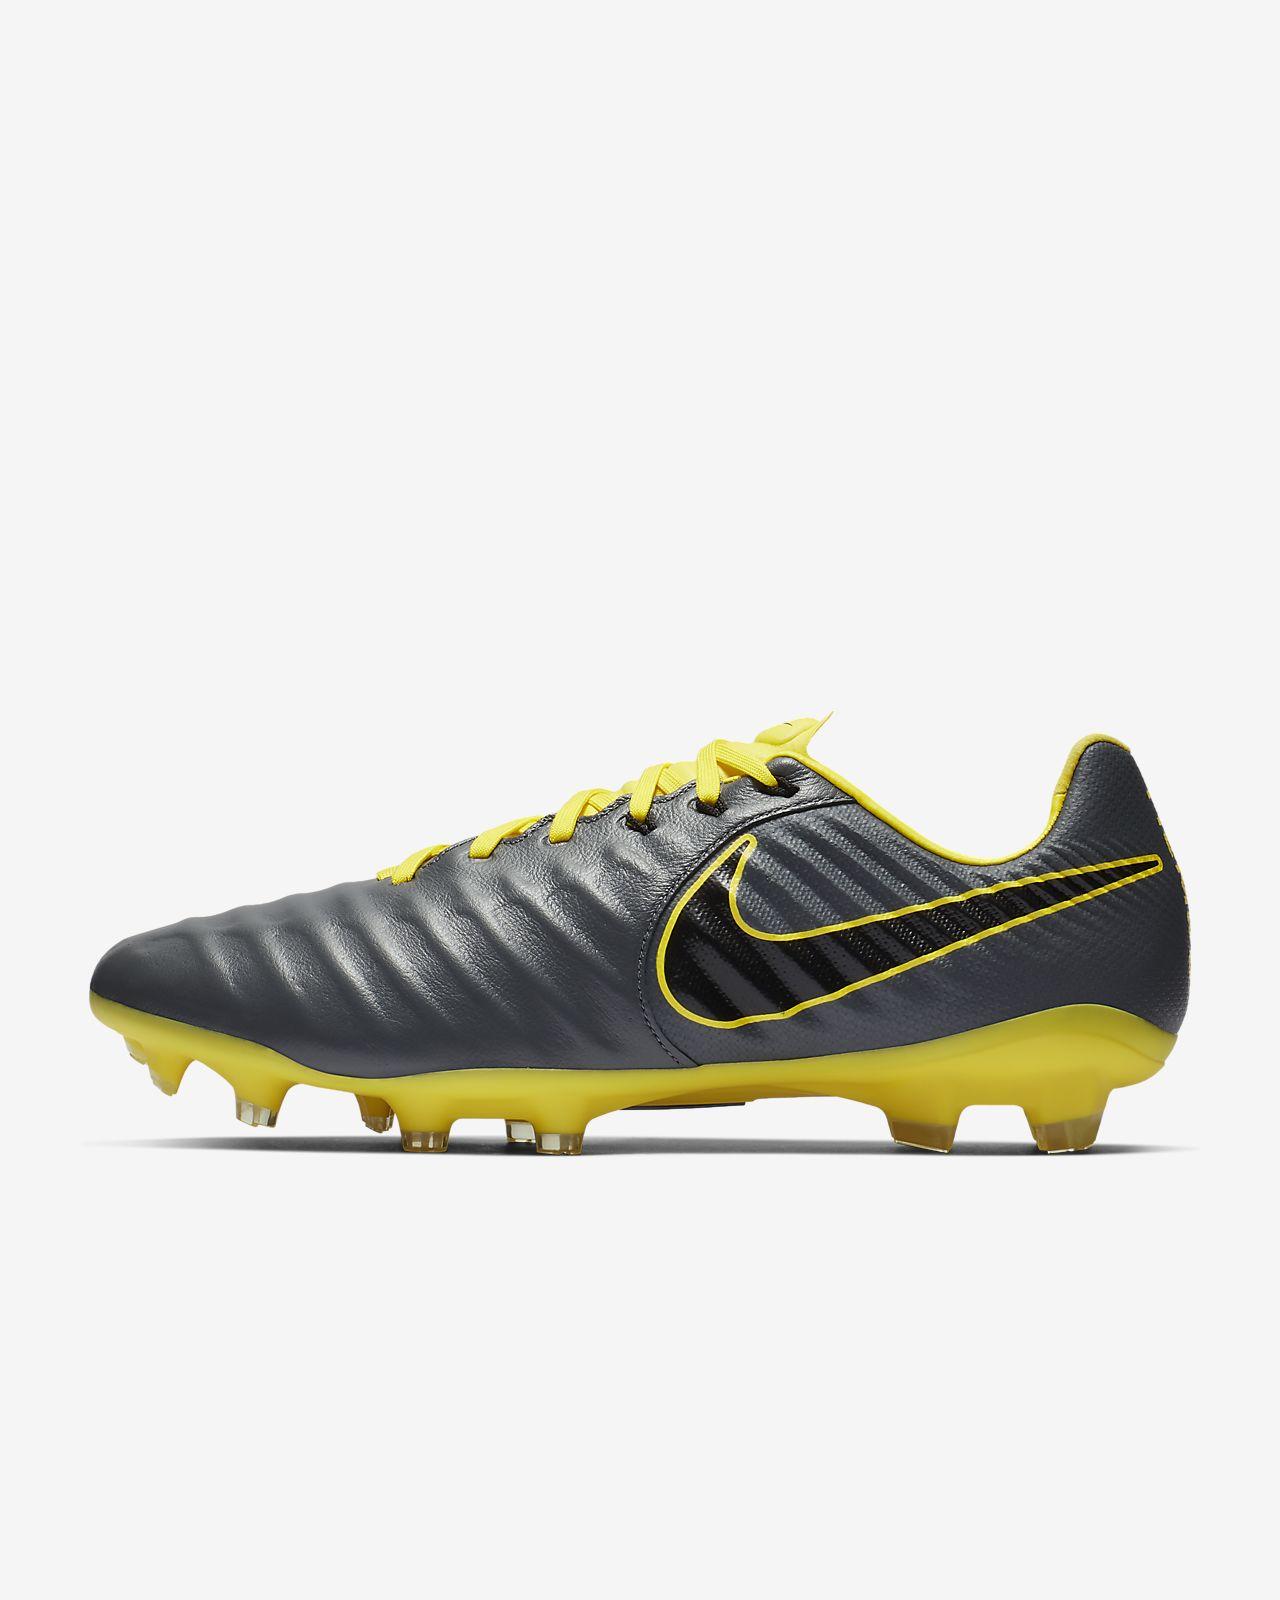 competitive price e103d 0e9ae Nike Legend 7 Pro FG Voetbalschoen (stevige ondergrond). Nike.com BE